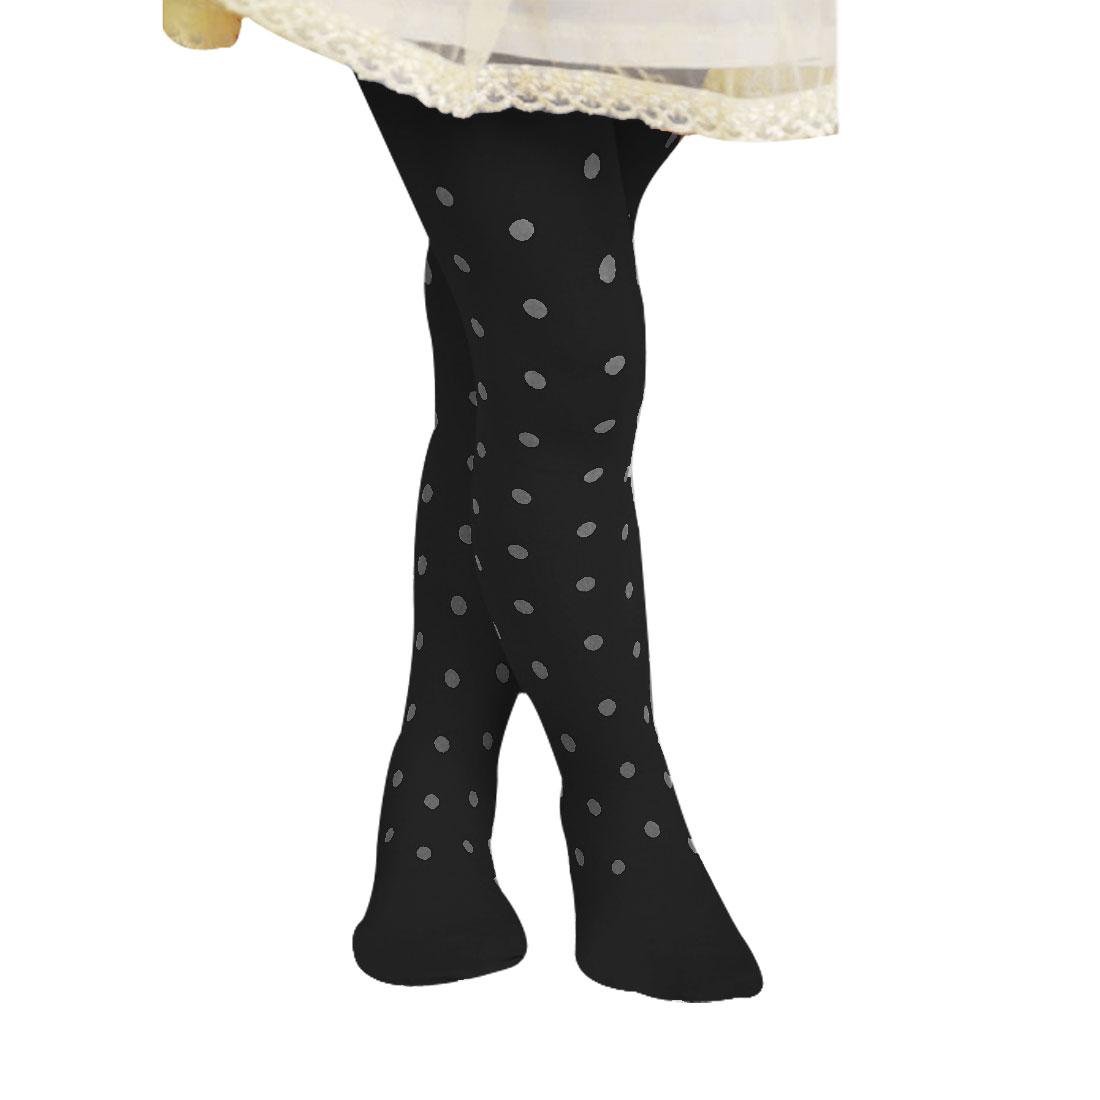 11-15 Age Girls Polka Dots Printed Stretch Bottoming Socks Leggings Black XL